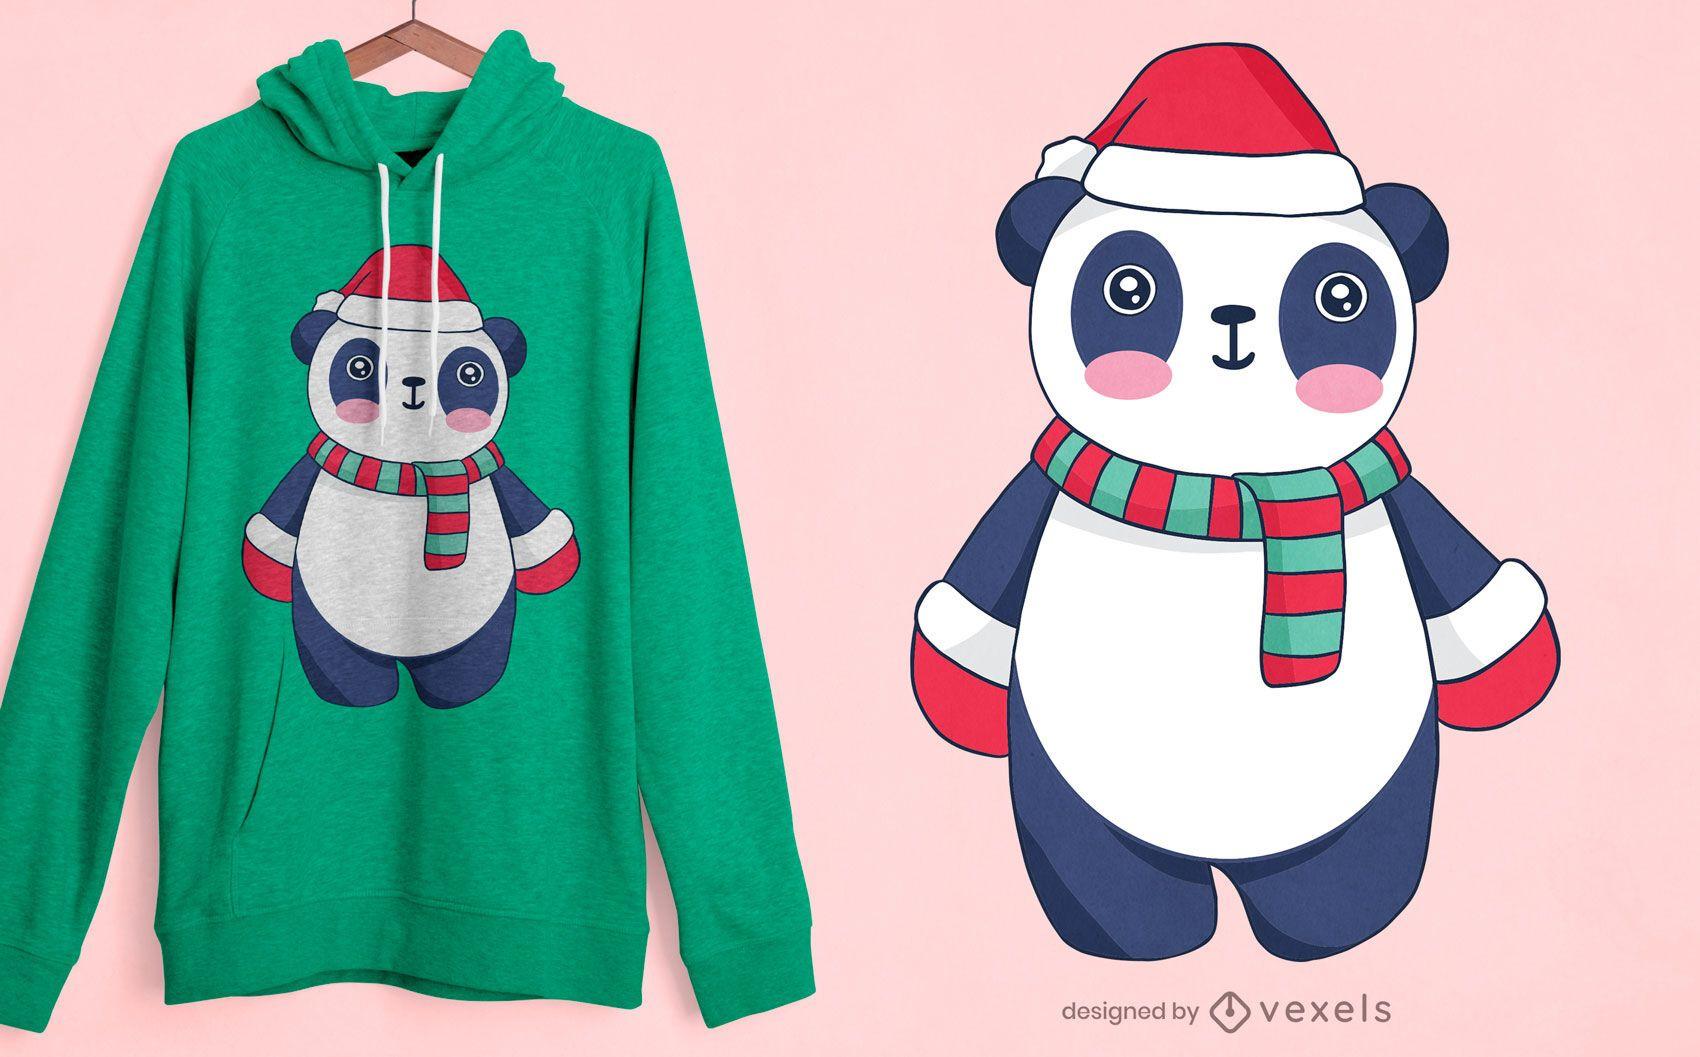 Lindo dise?o de camiseta de panda navide?o